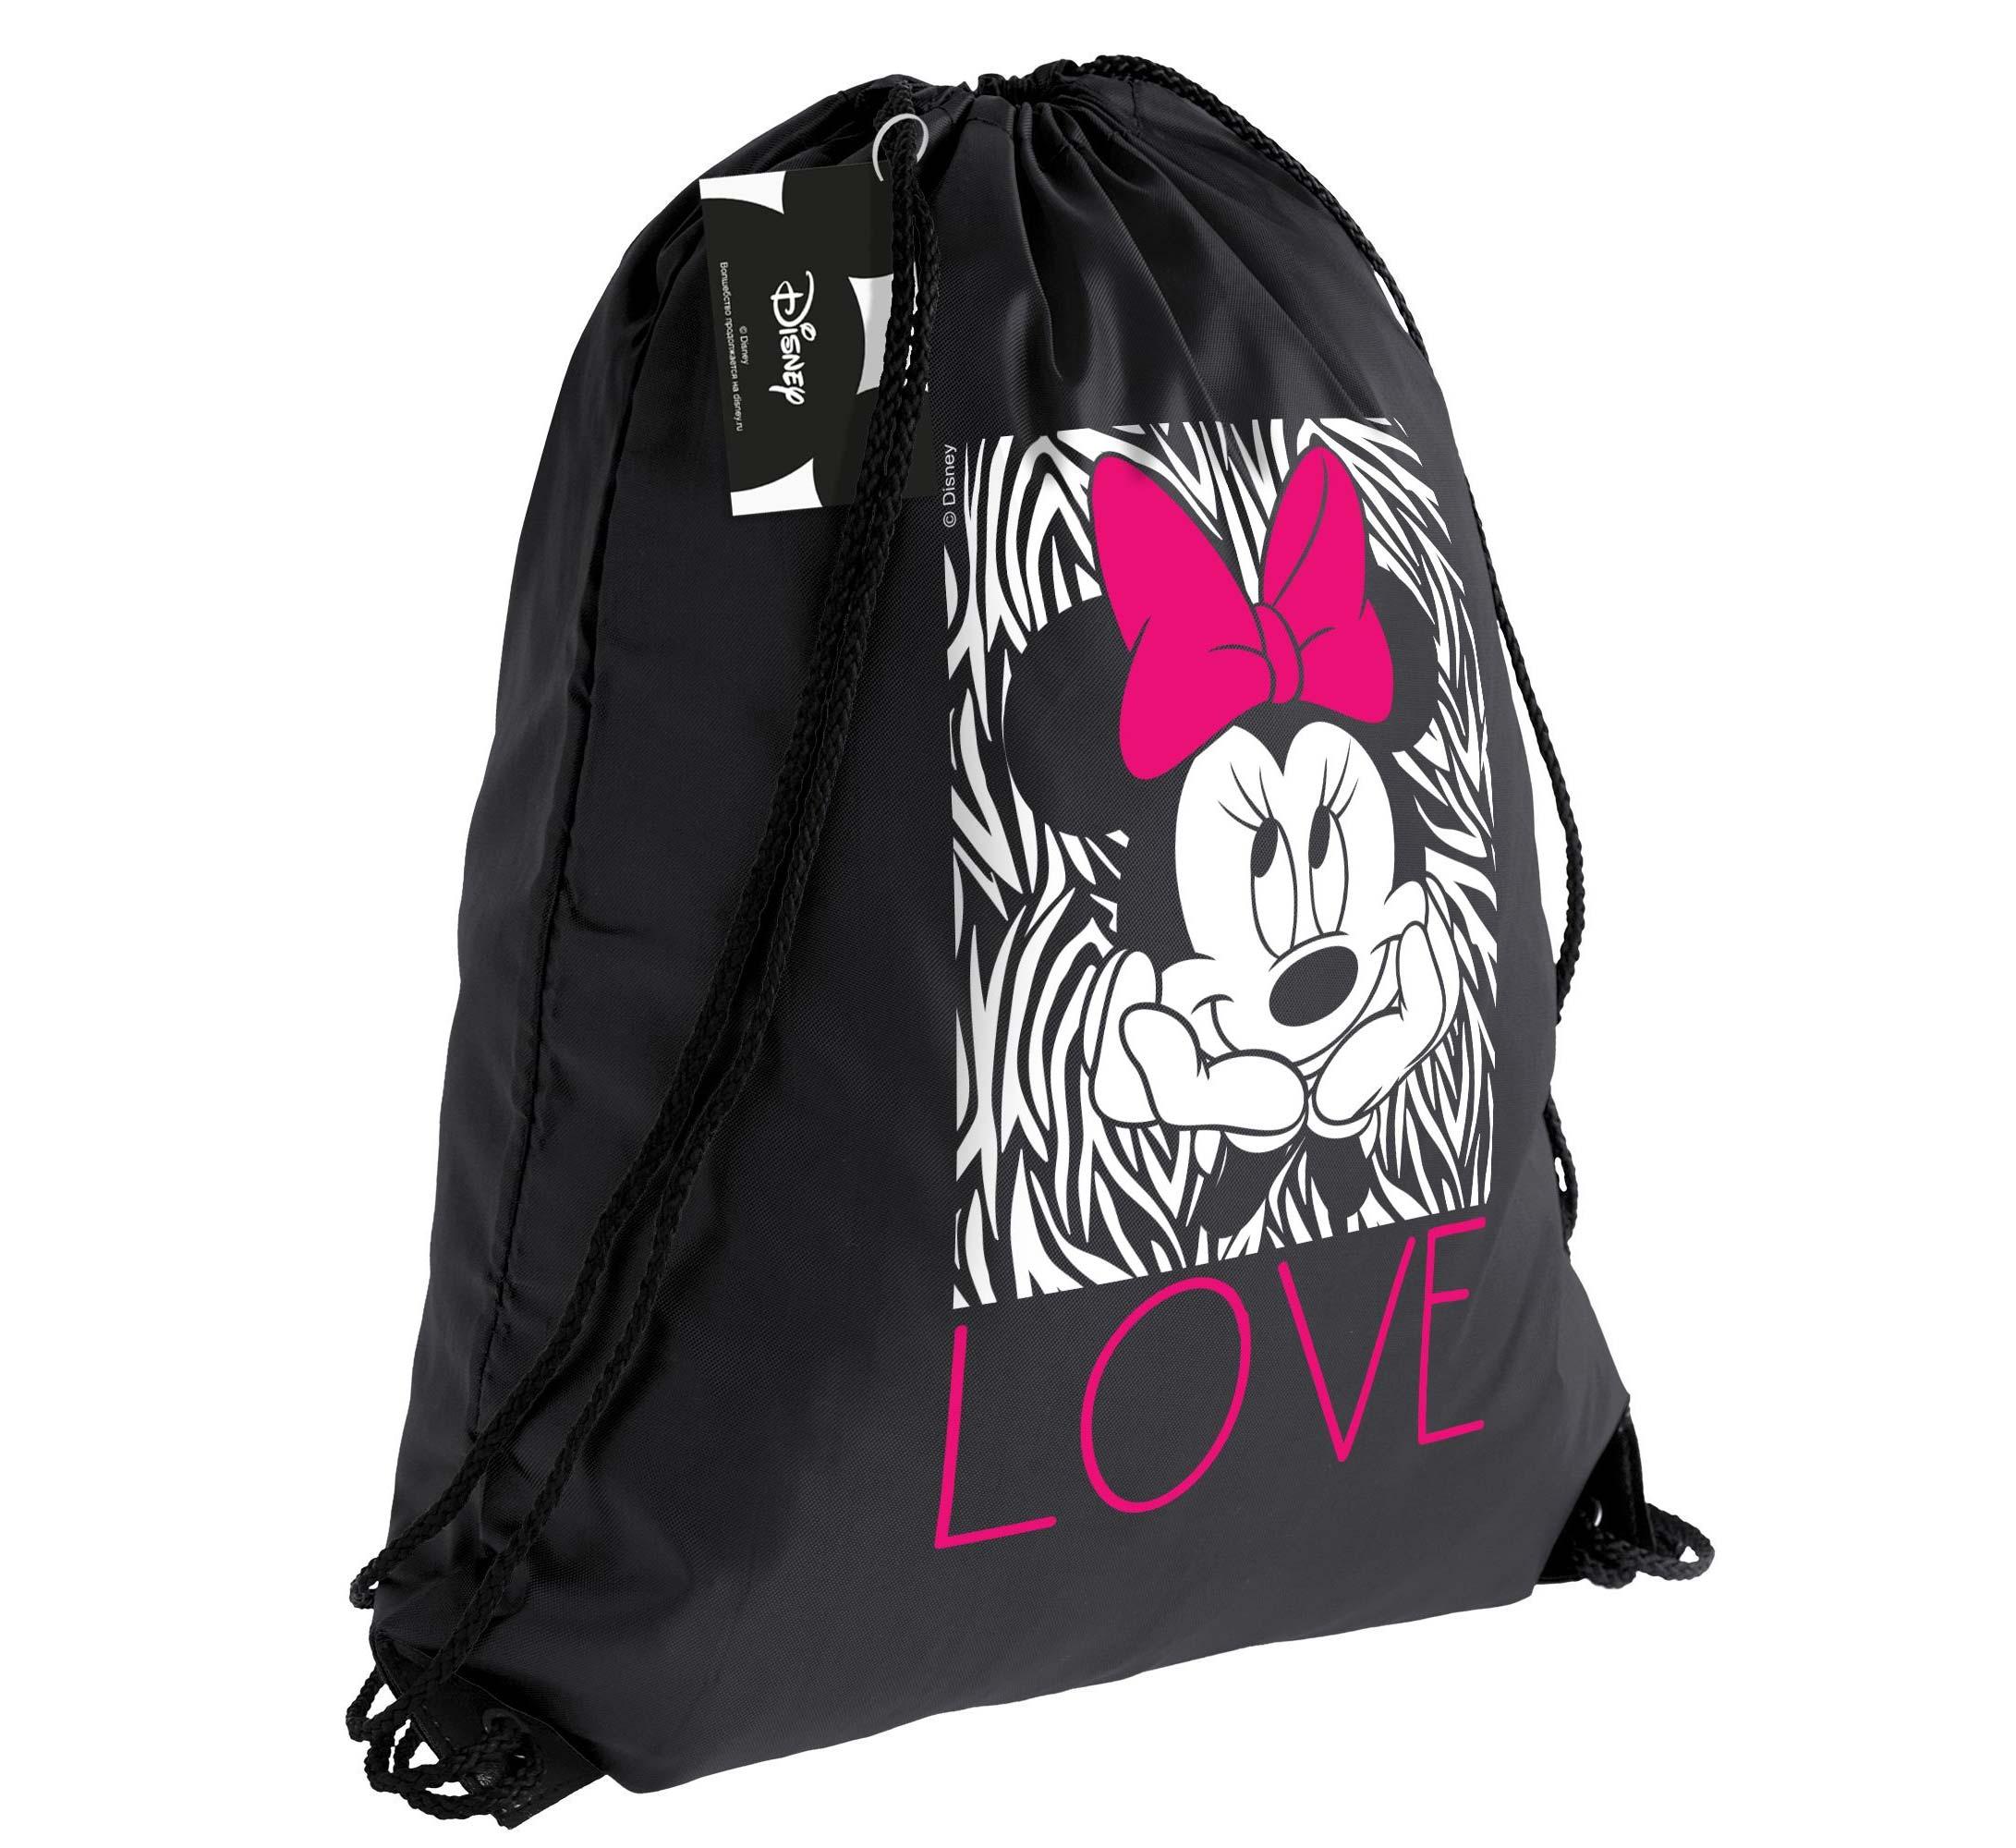 Рюкзак / мешок для сменки  Минни Маус. In Love арт. 55526.31